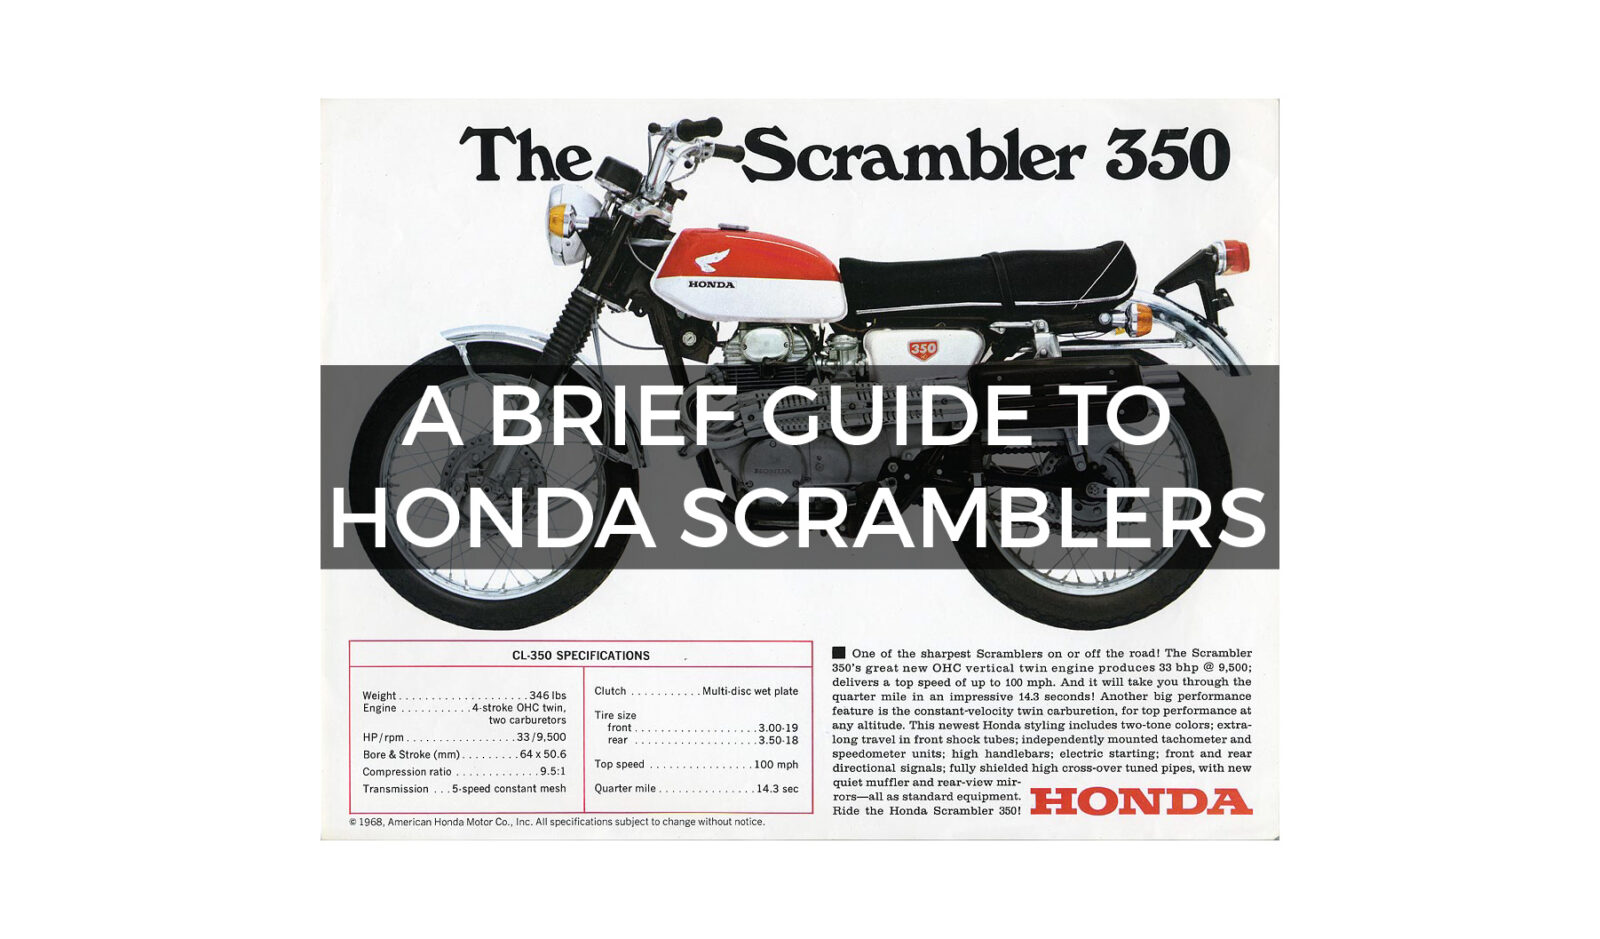 hight resolution of a brief 1600x939 a brief guide to honda scramblers